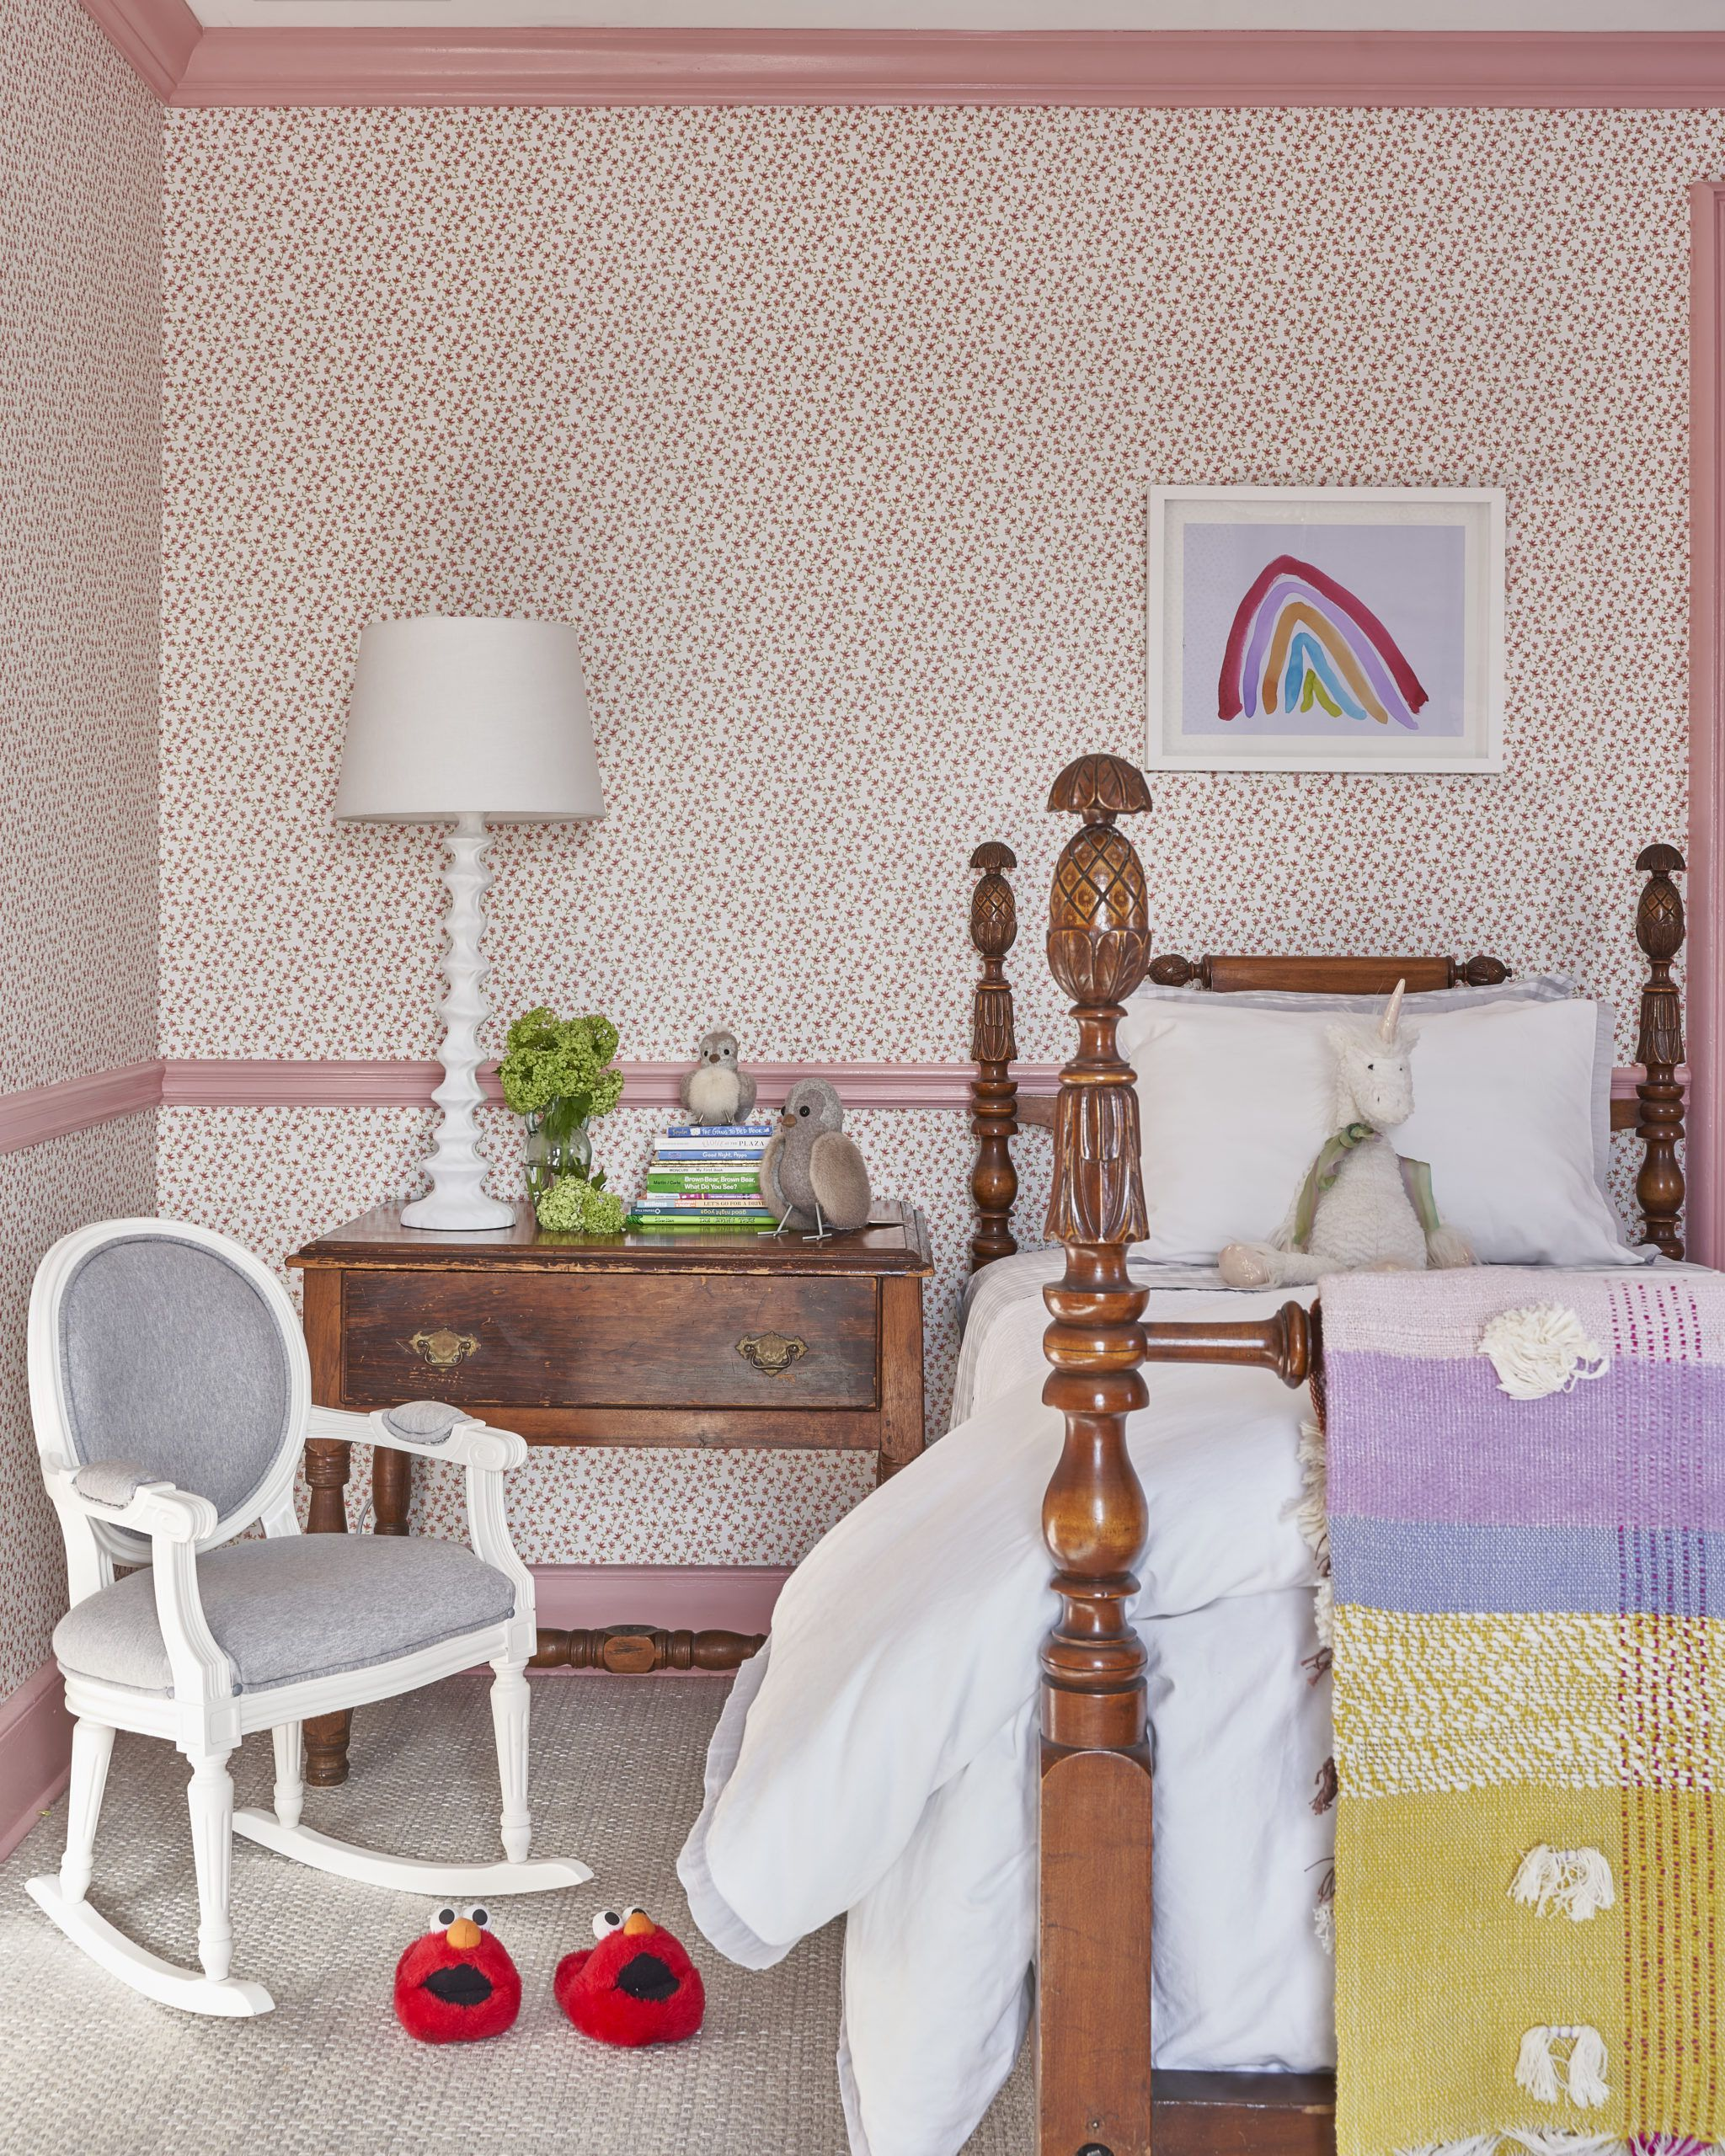 Tiny Flowers Wallpaper • Micro Floral Wallpaper • Ashley Darryl • Bedroom Interior